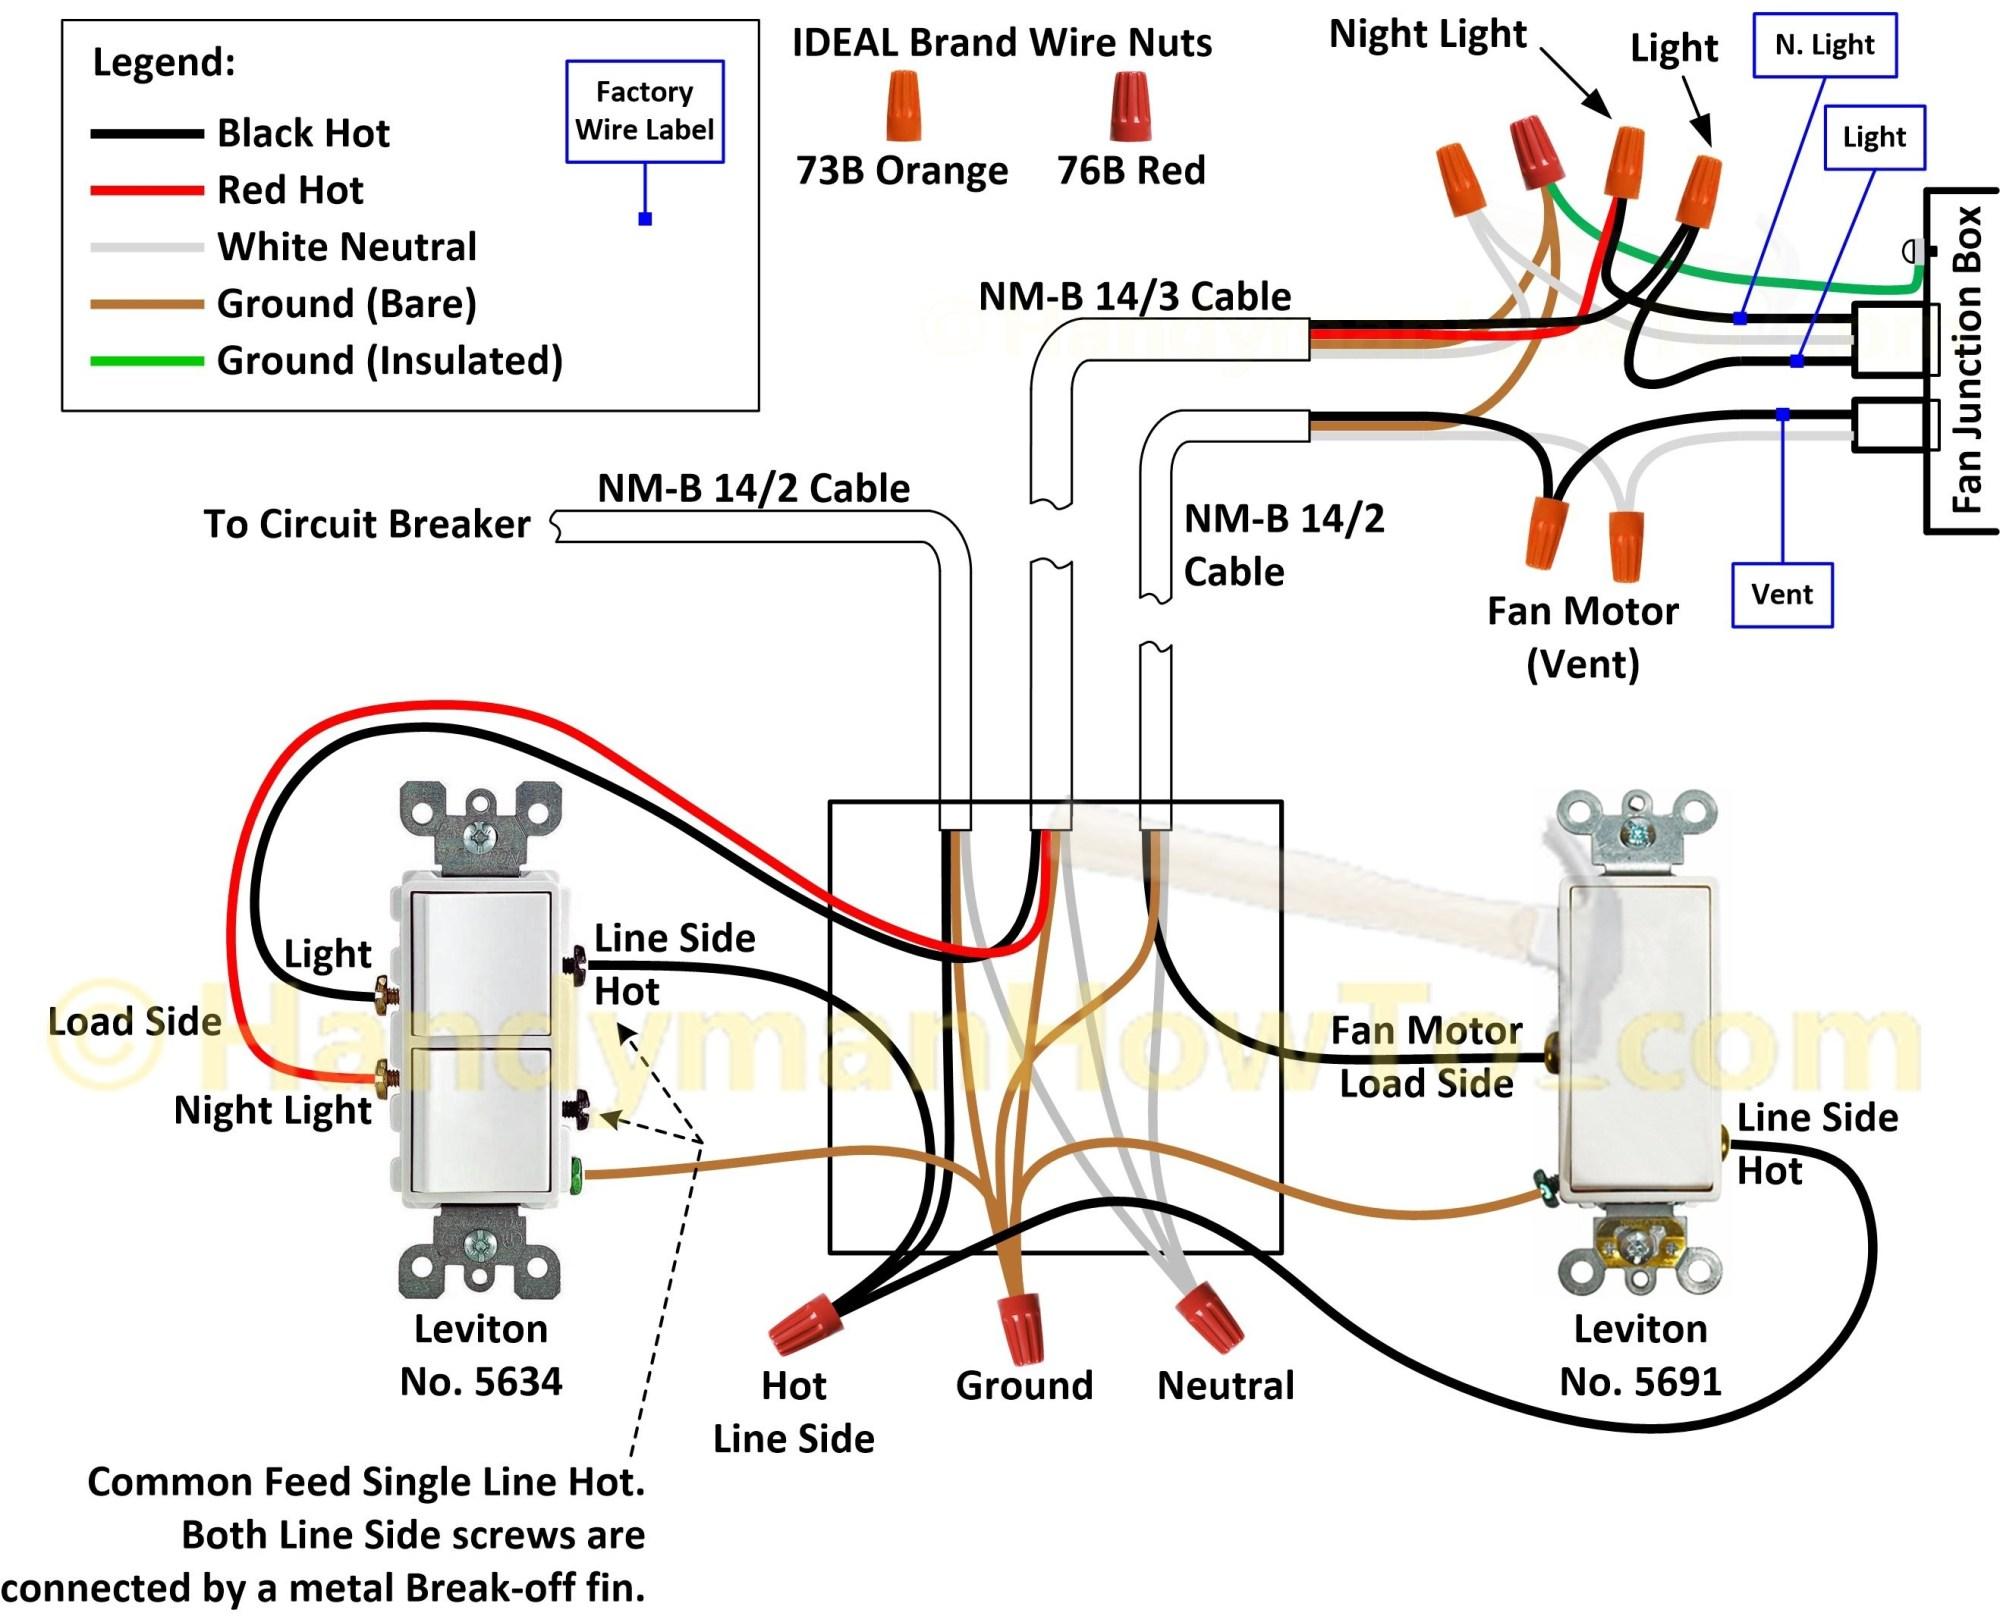 hight resolution of isuzu rodeo engine diagram wiring a bathroom fan and light diagram wiring diagram of isuzu rodeo